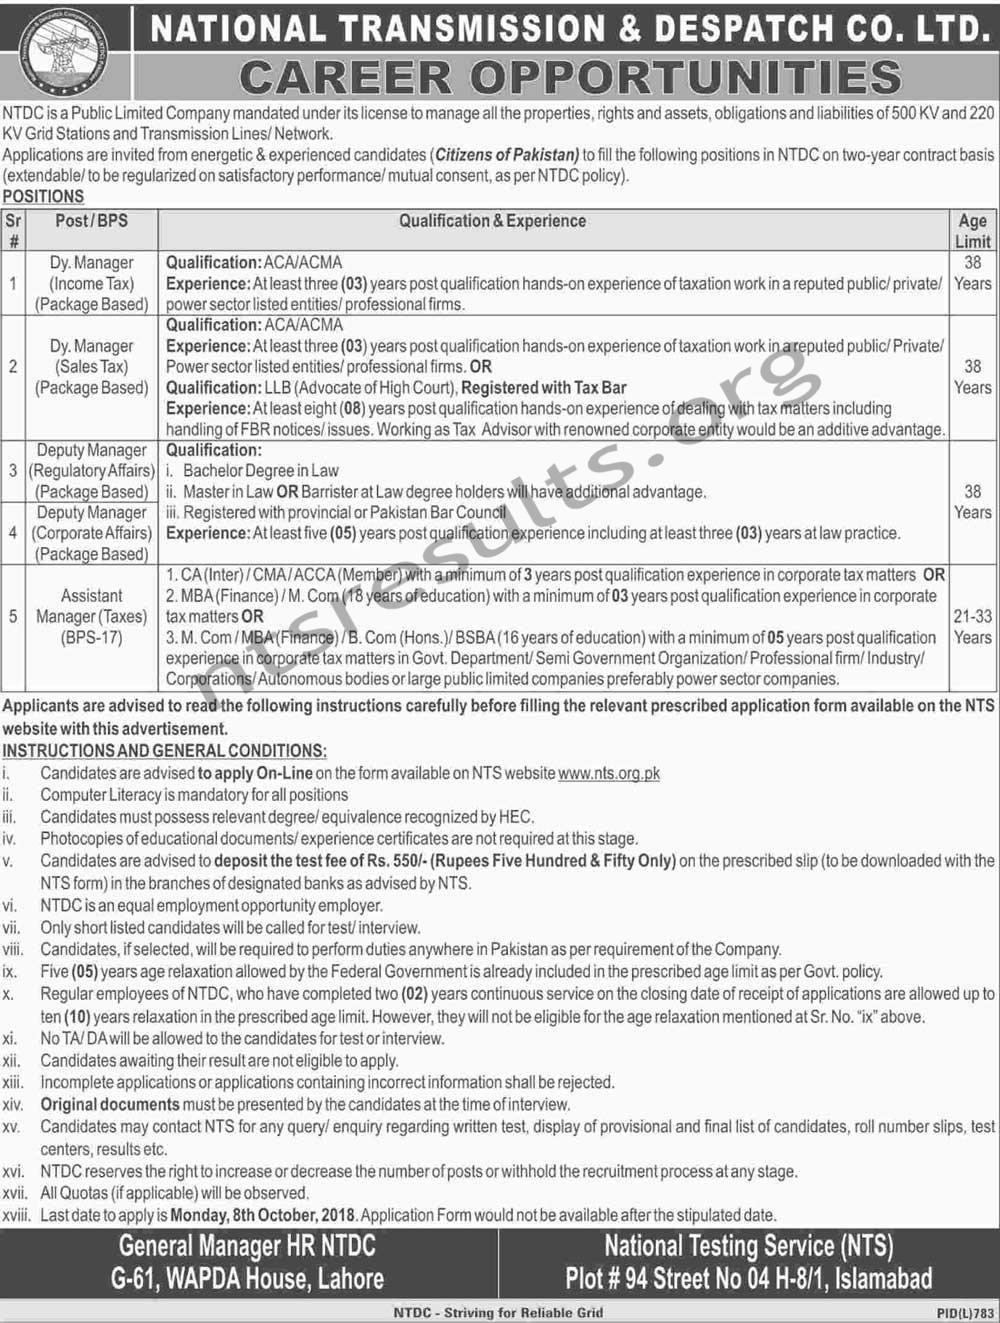 National Transmission Dispatch Company NTDC BPS 17 18 Jobs Via NTS